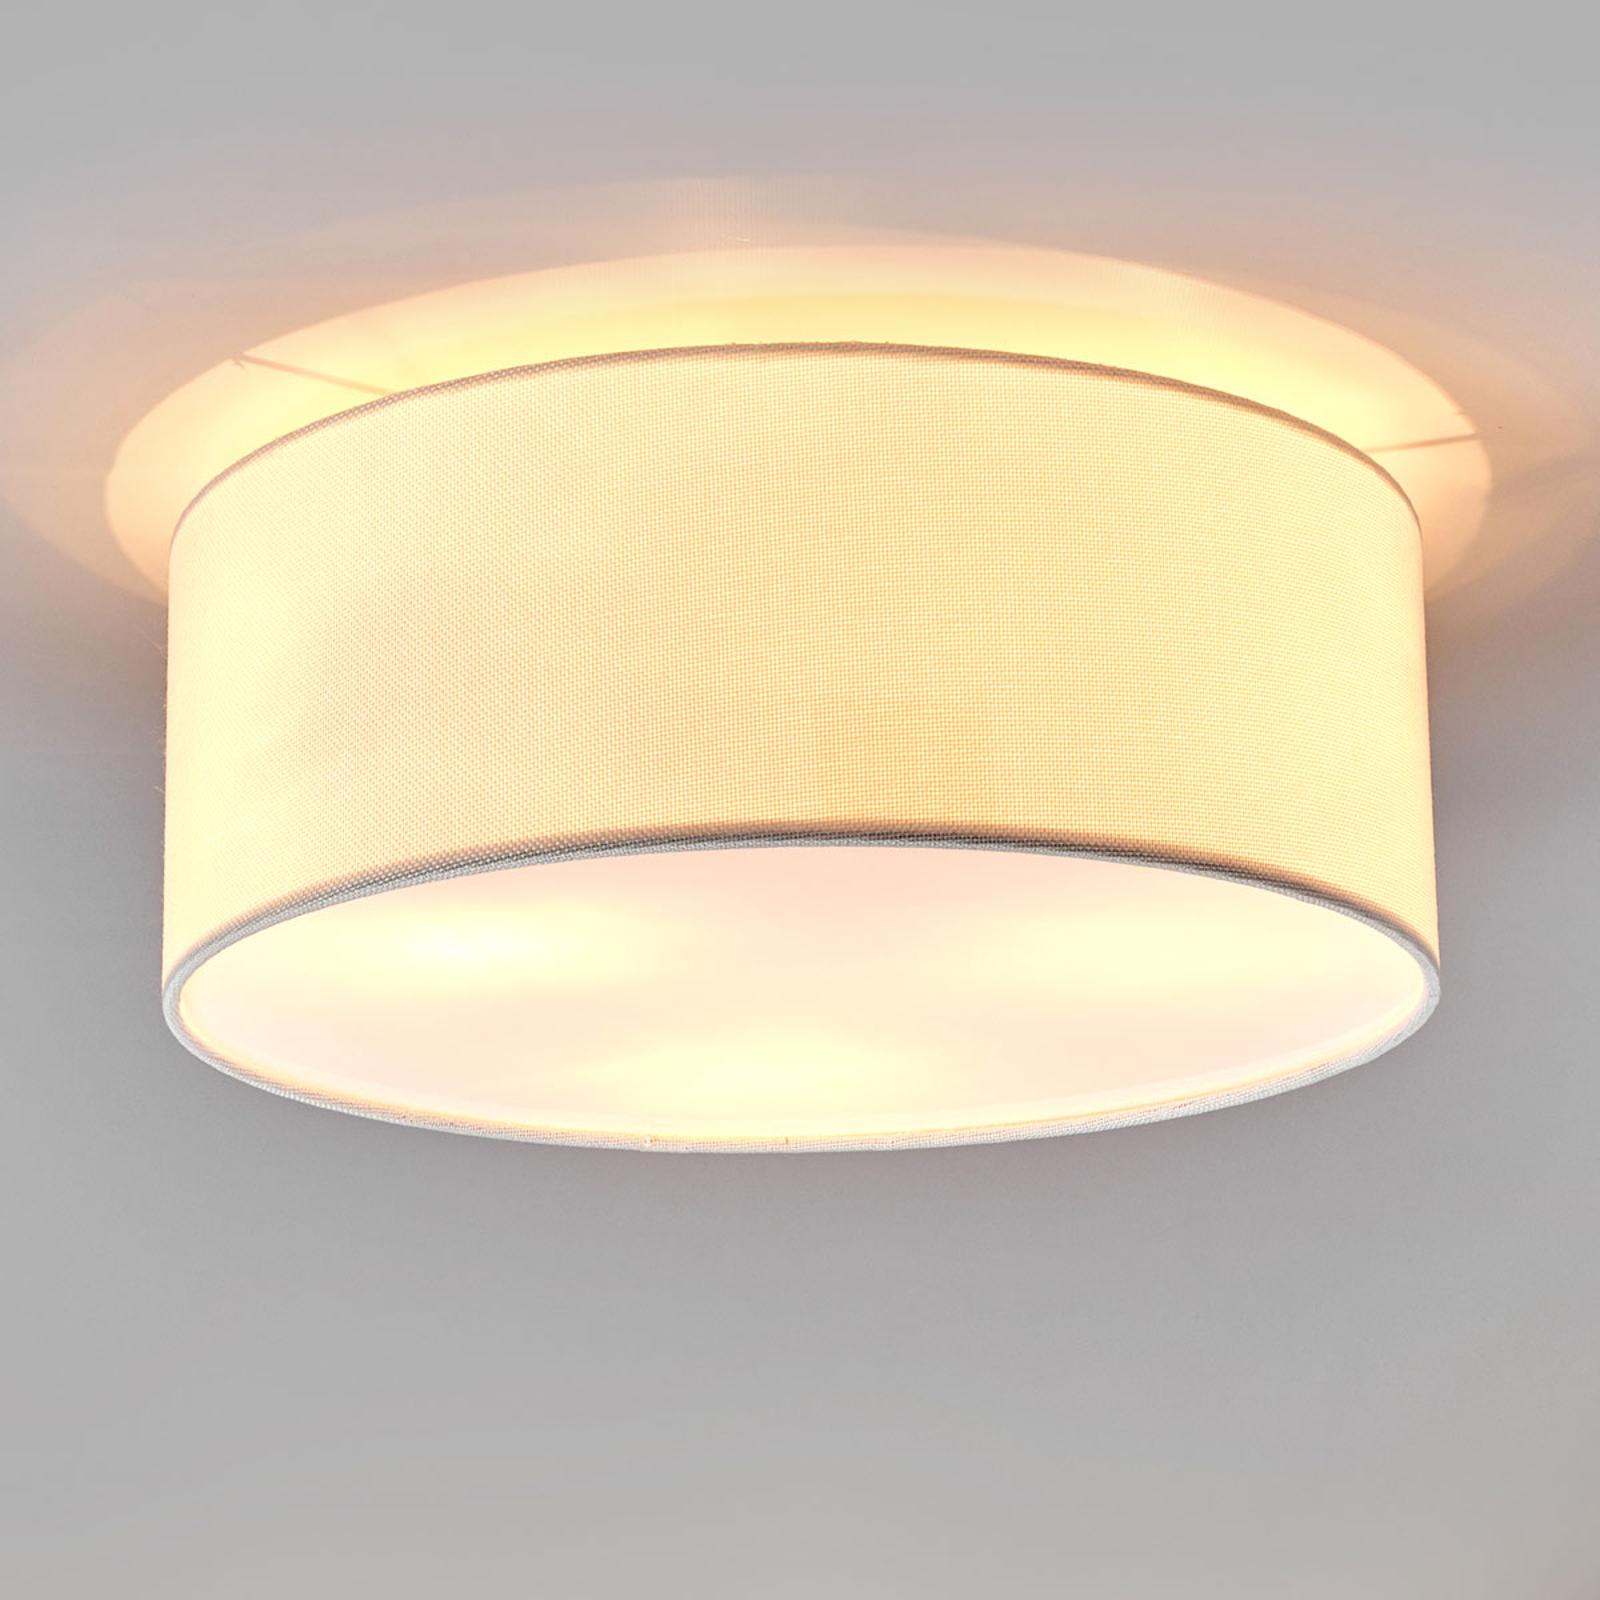 Biała materiałowa lampa sufitowa Henrika